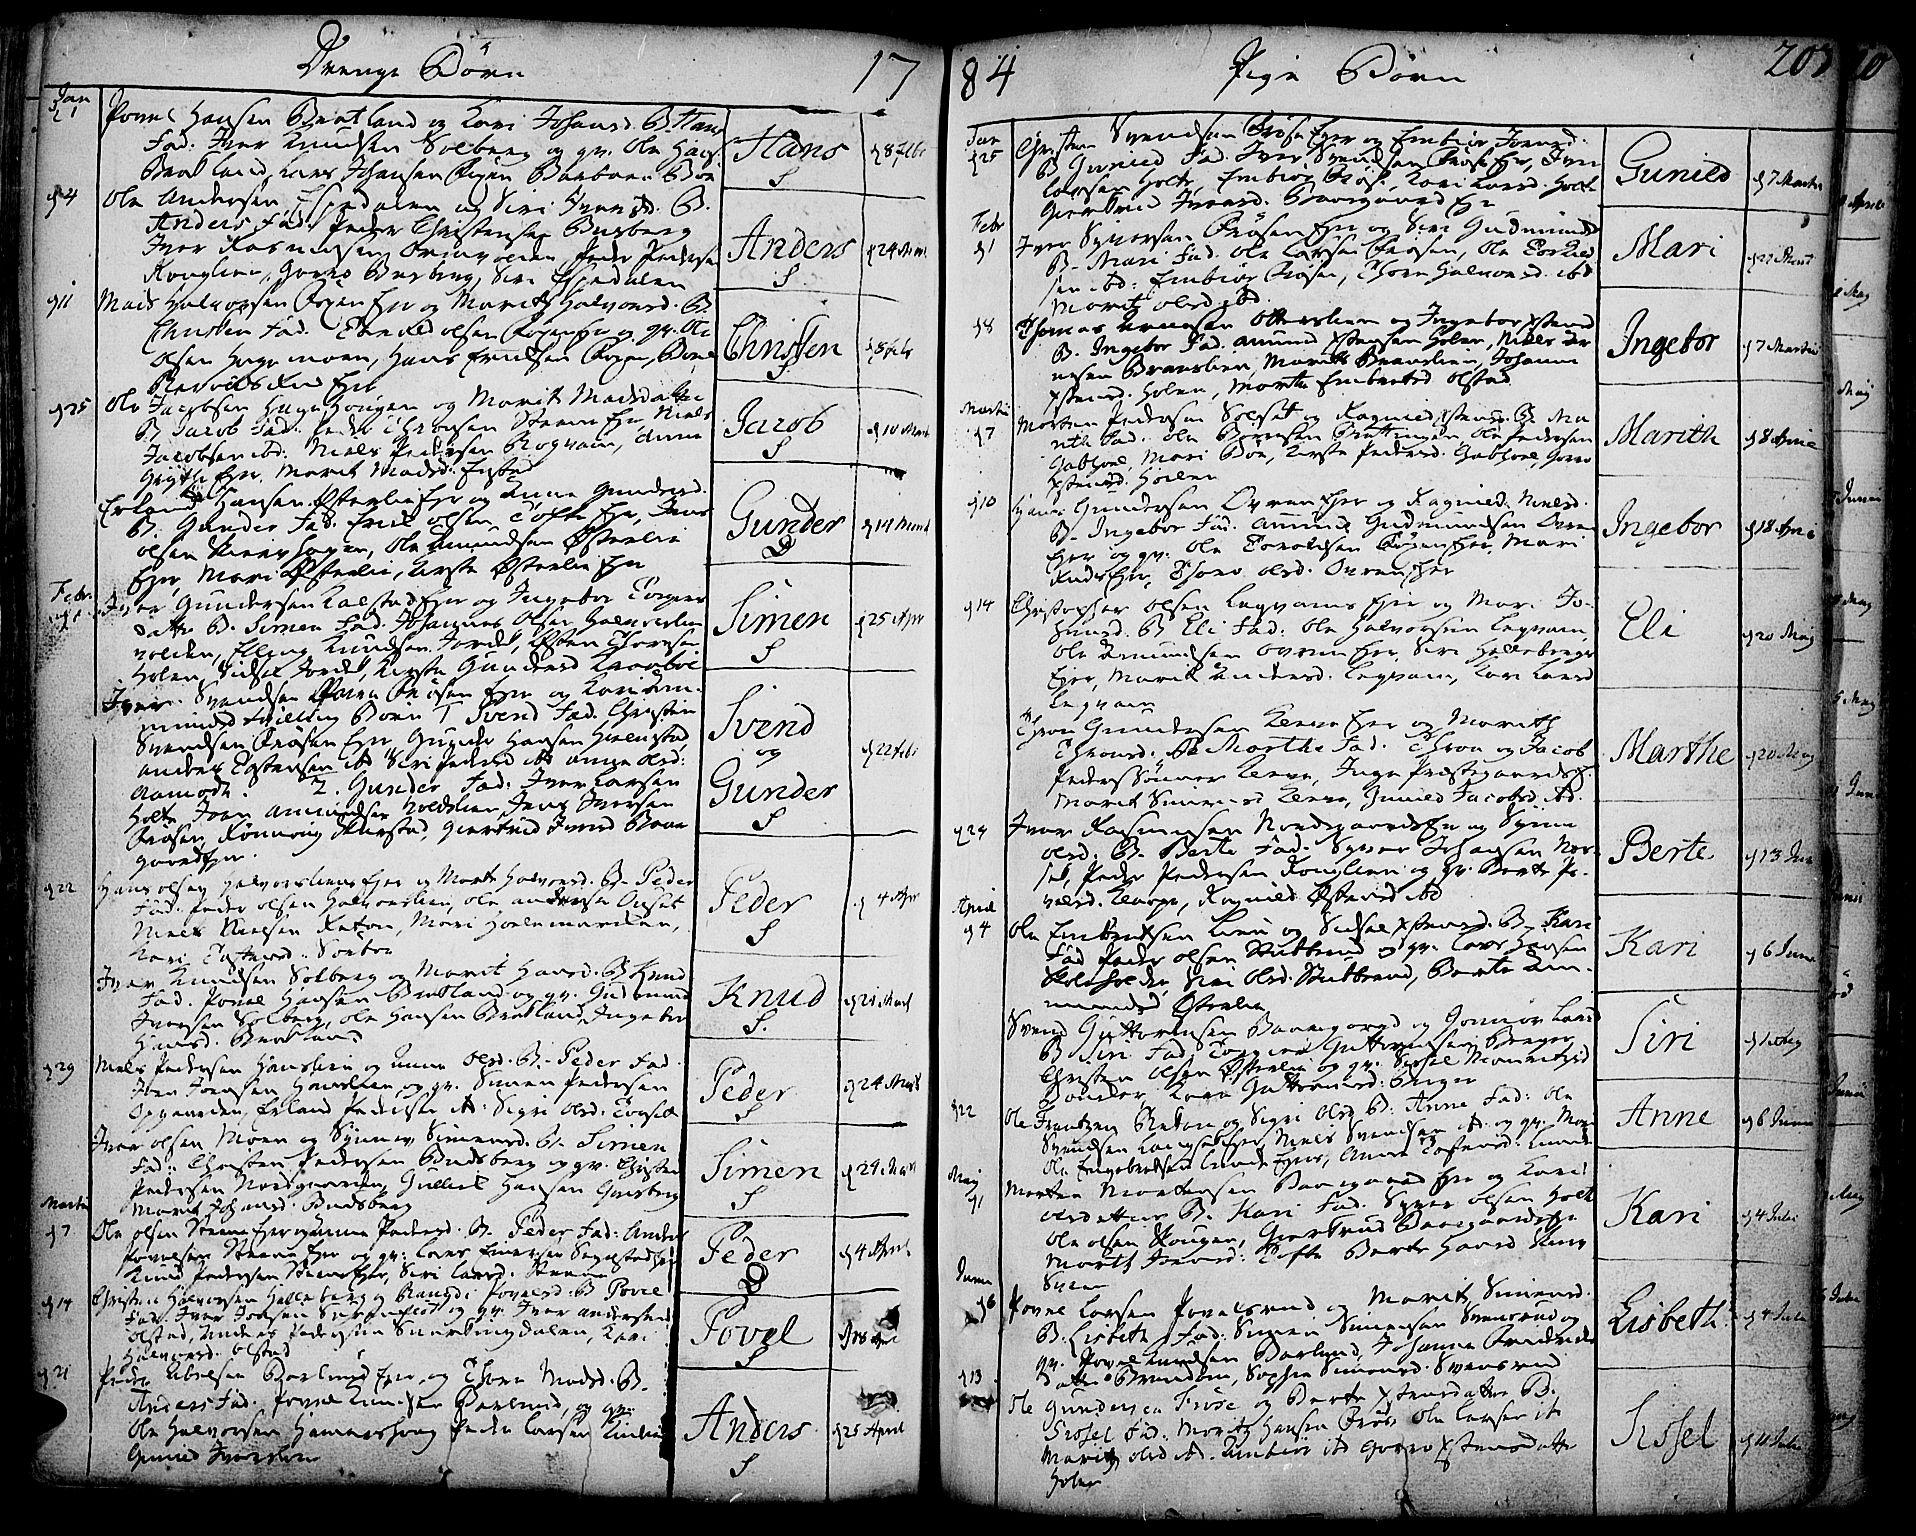 SAH, Gausdal prestekontor, Ministerialbok nr. 3, 1758-1809, s. 203